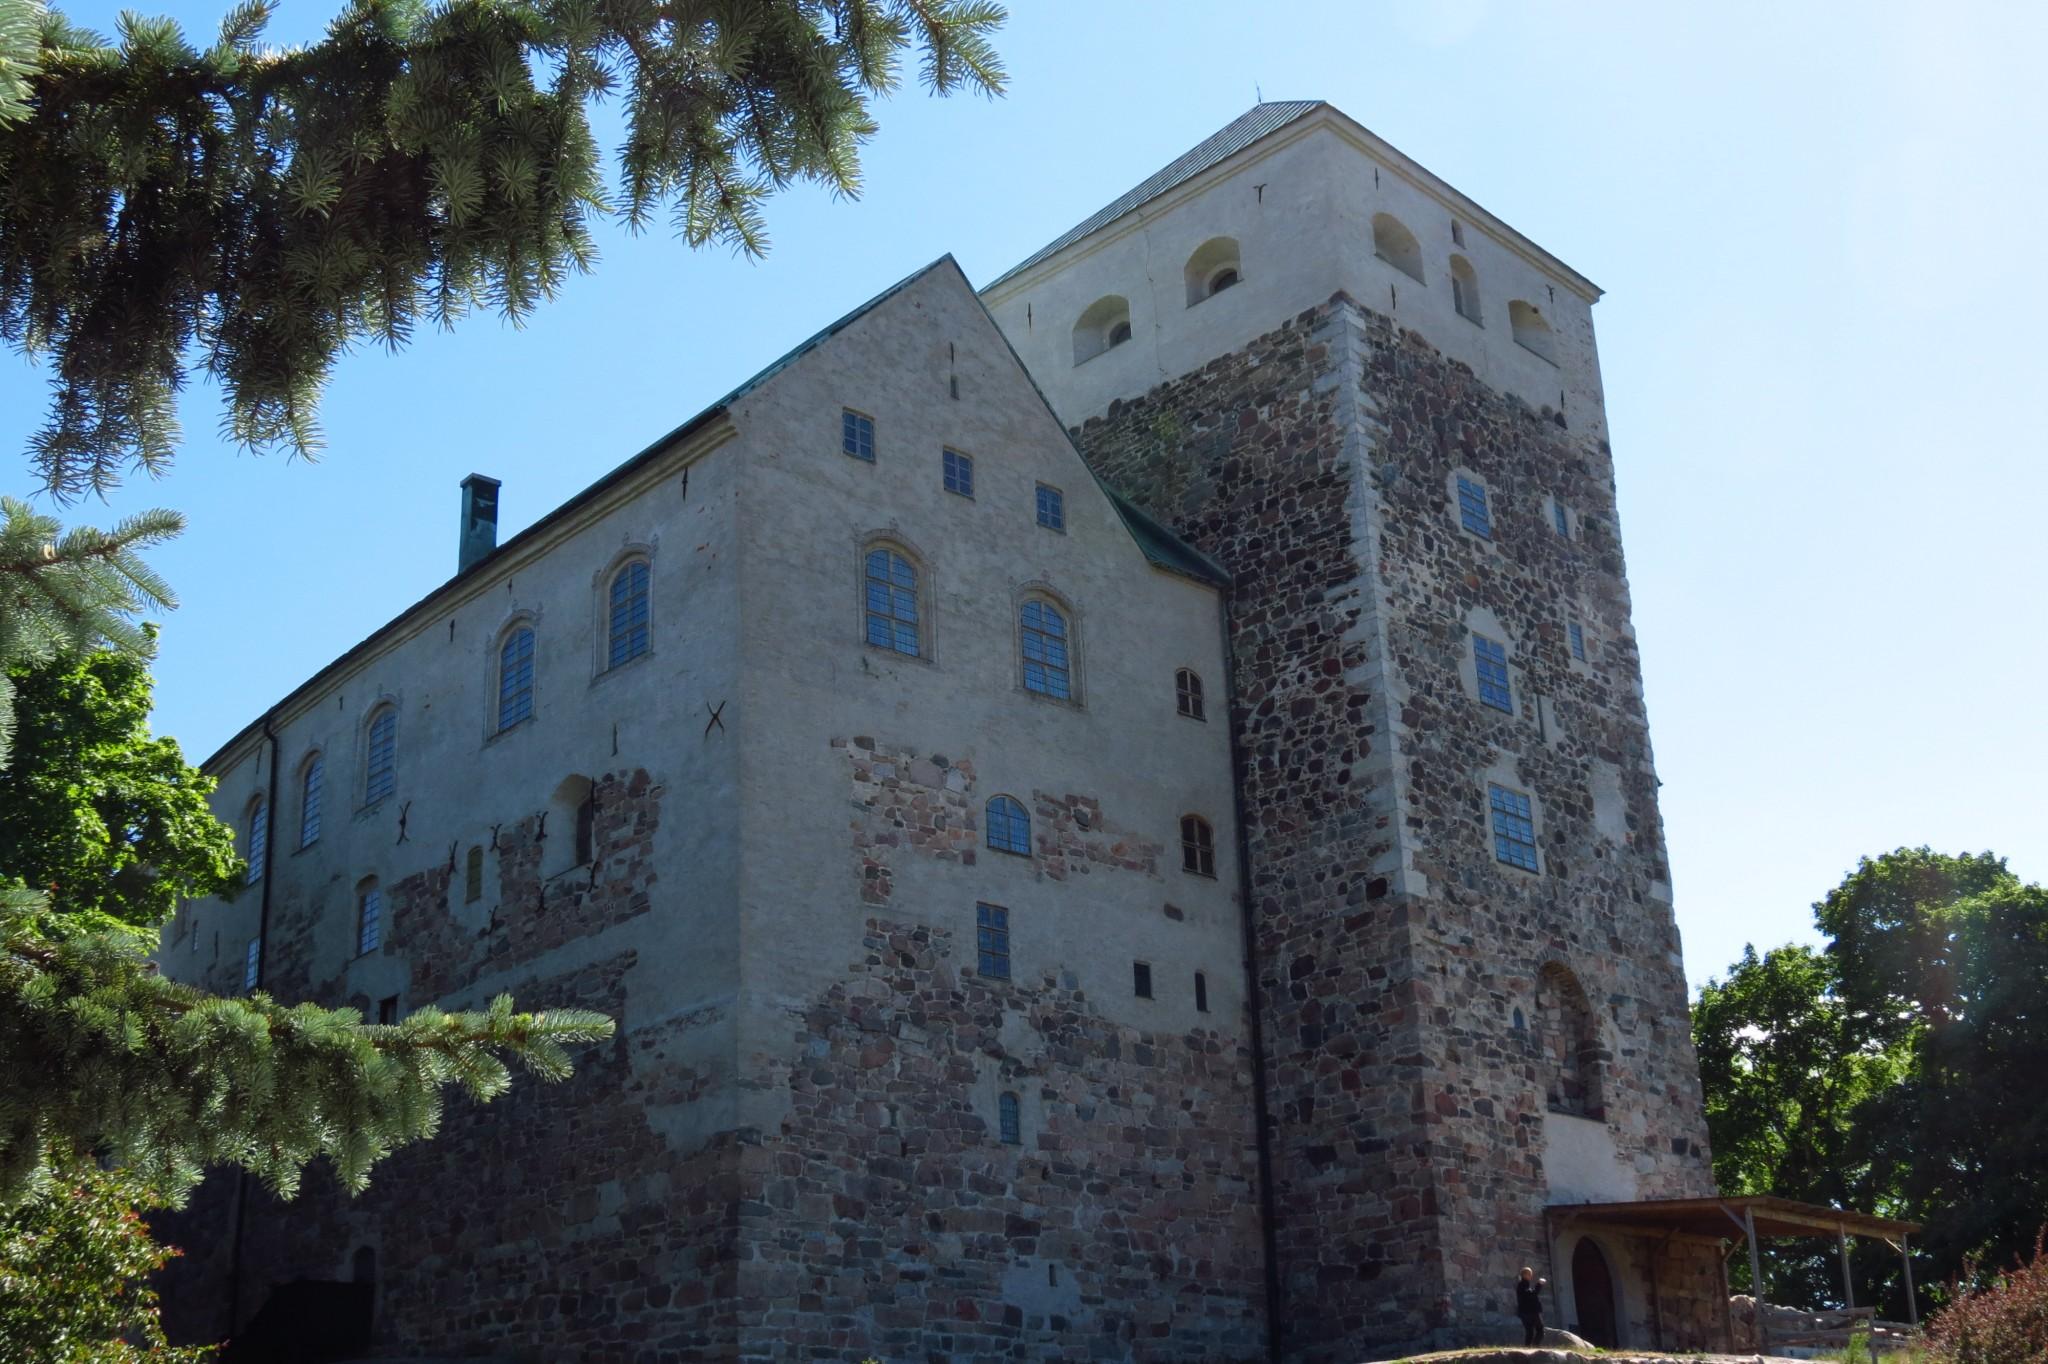 Turkkusen linna, Åboborgs slott